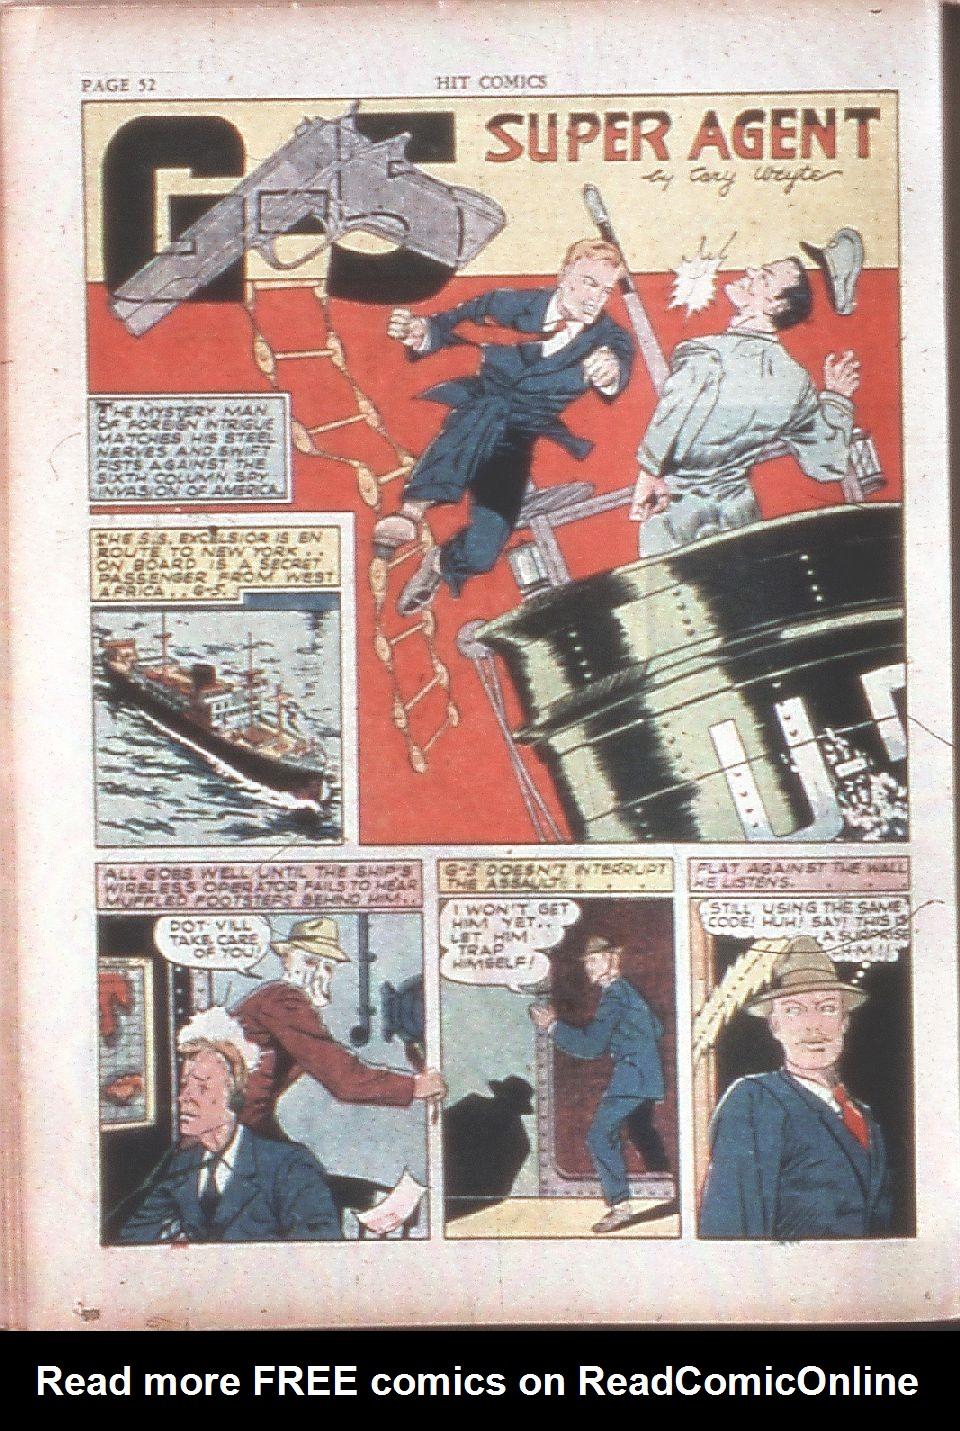 Read online Hit Comics comic -  Issue #15 - 54